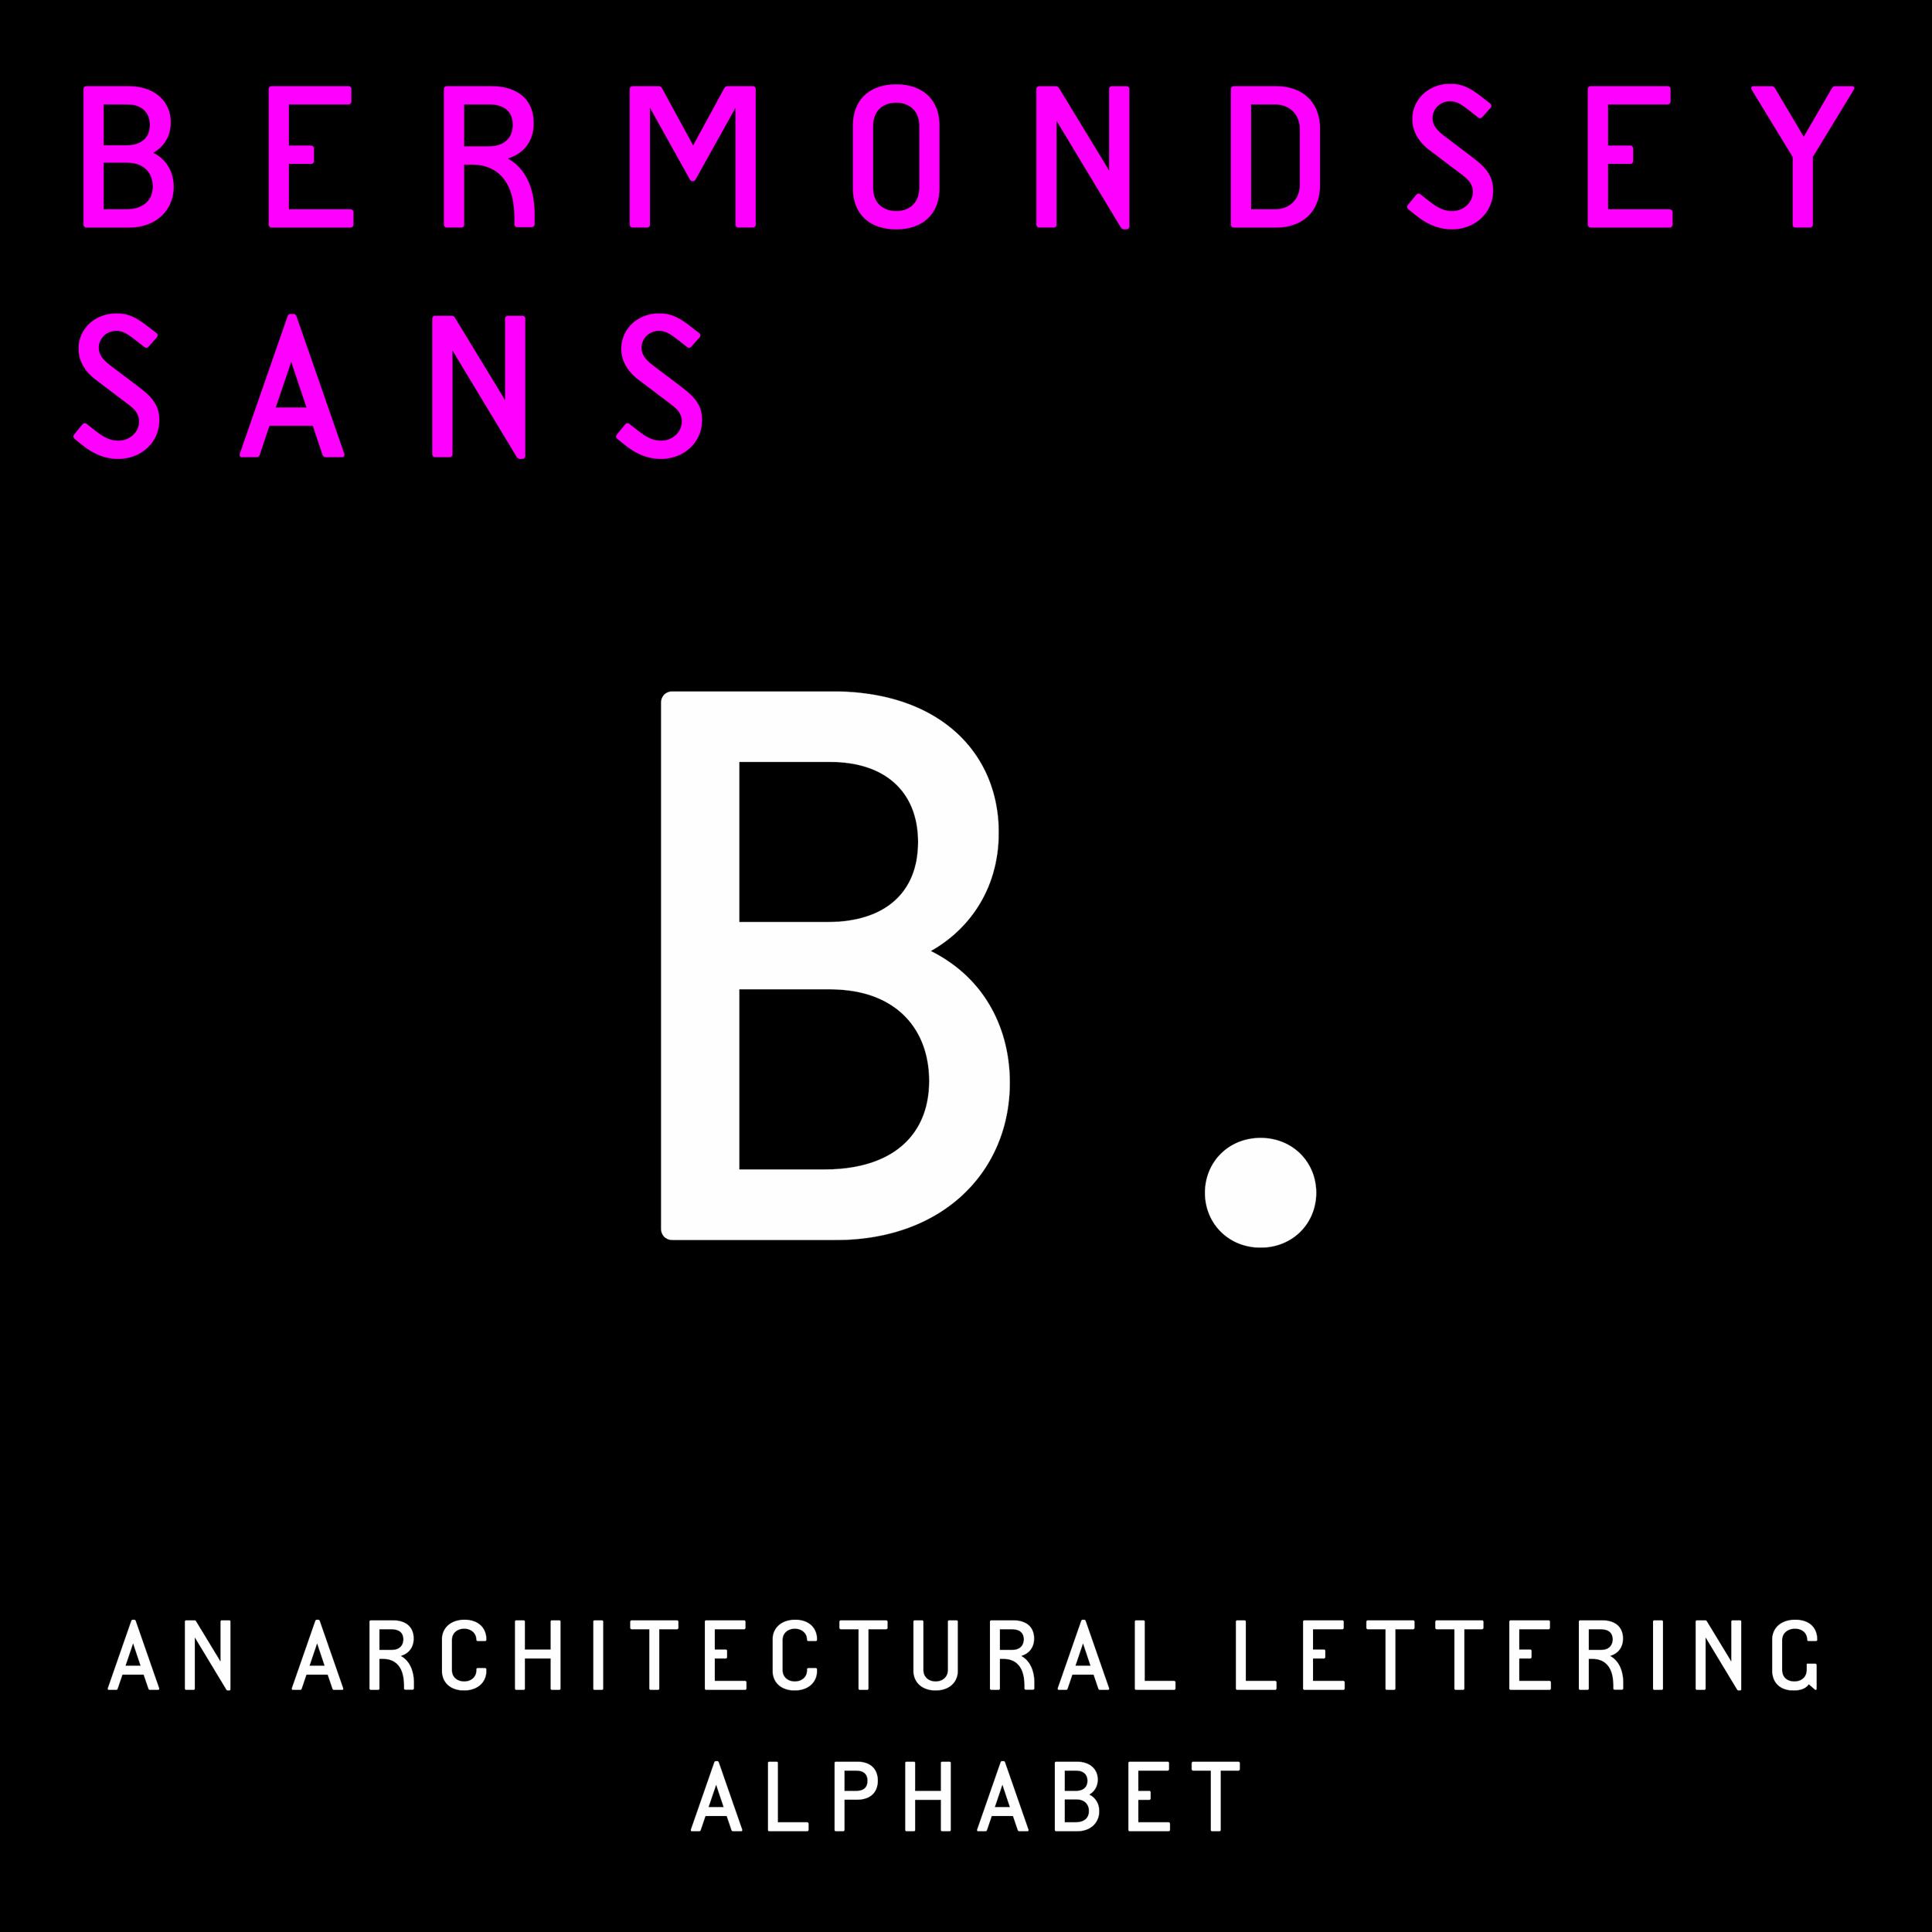 Bermondsey Sans sample